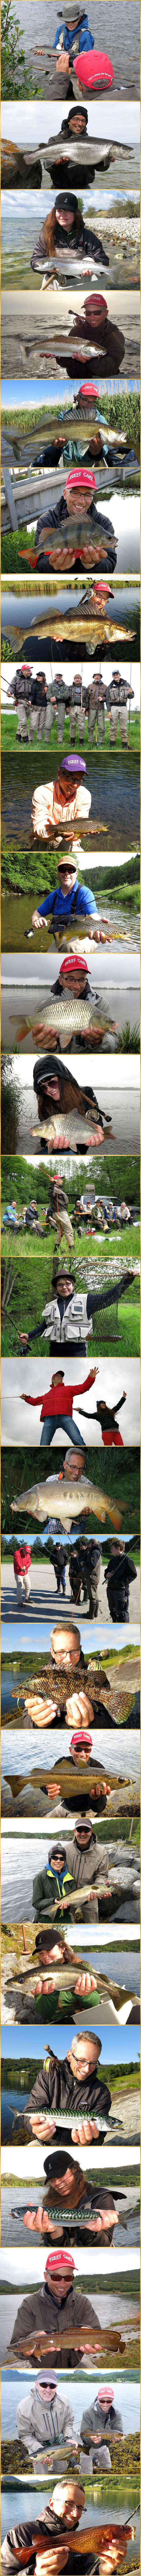 flyfishing school bernd ziesche